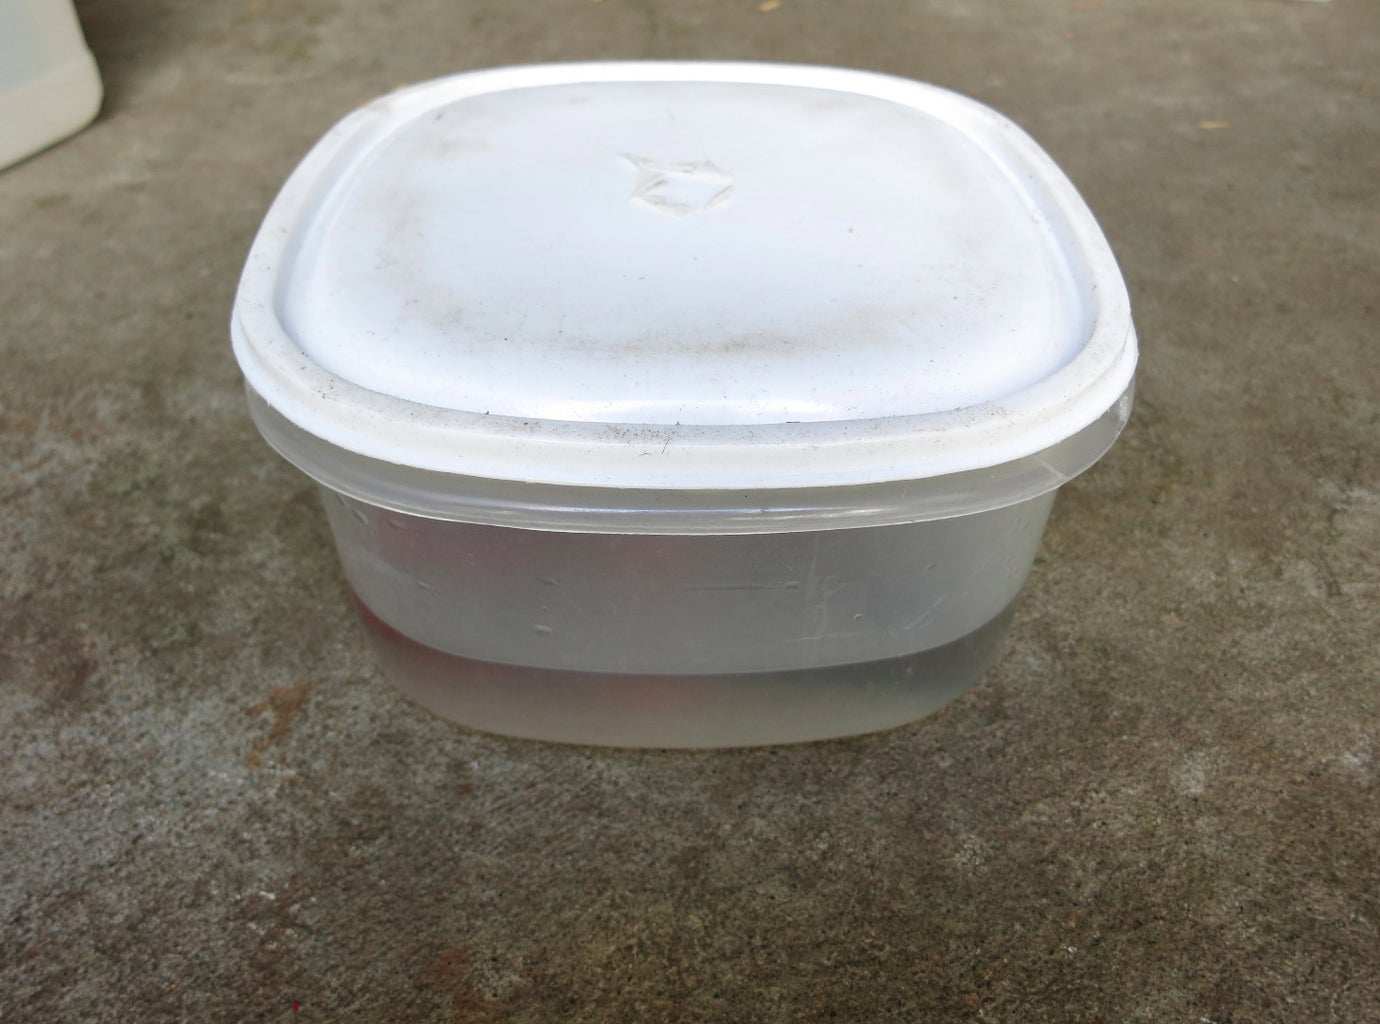 Rust Removal Part 1: Vinegar Bath